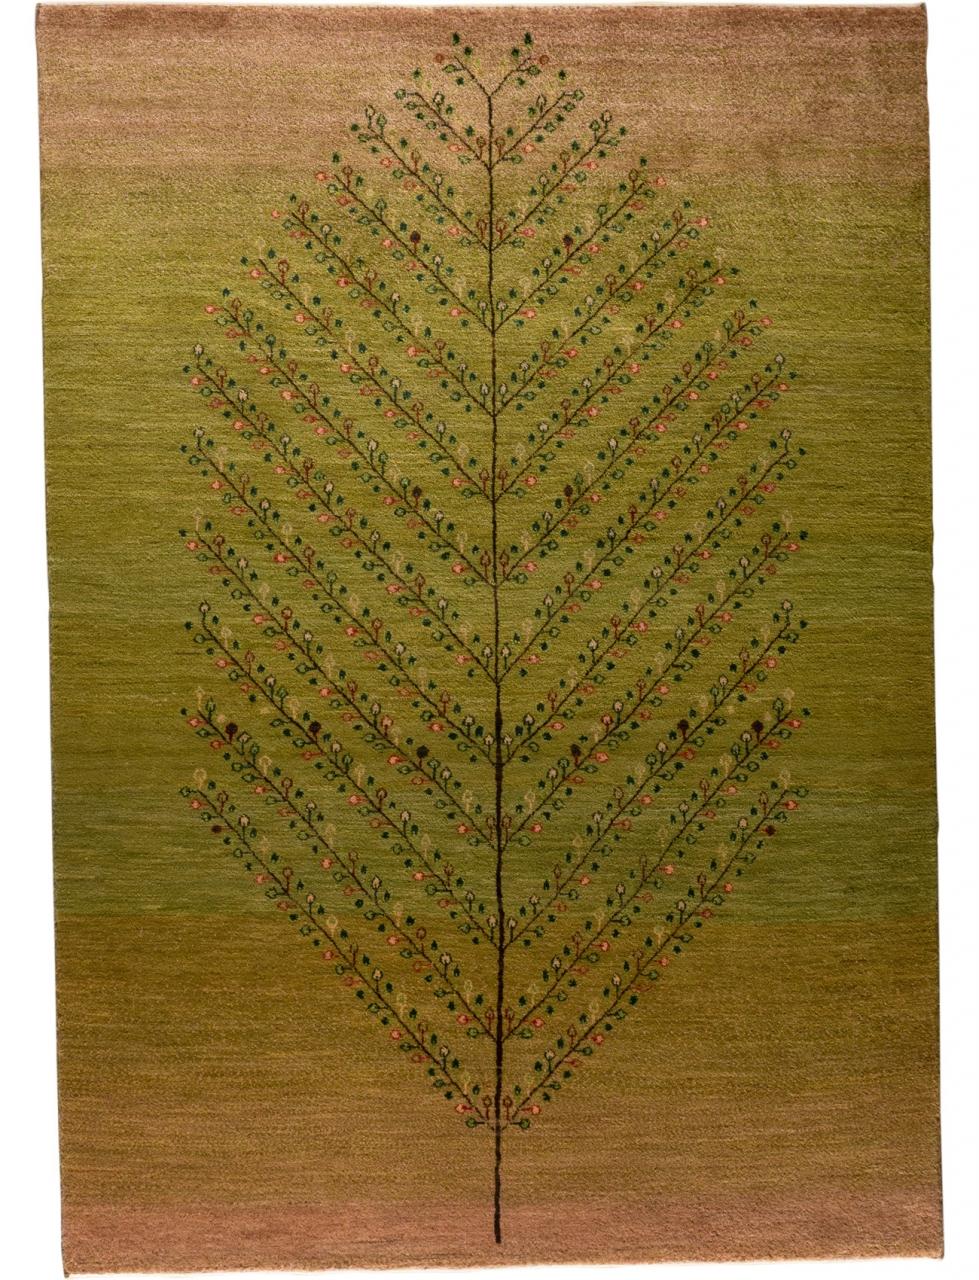 Iran Gabbeh Teppich-Unikat Baum des Lebens